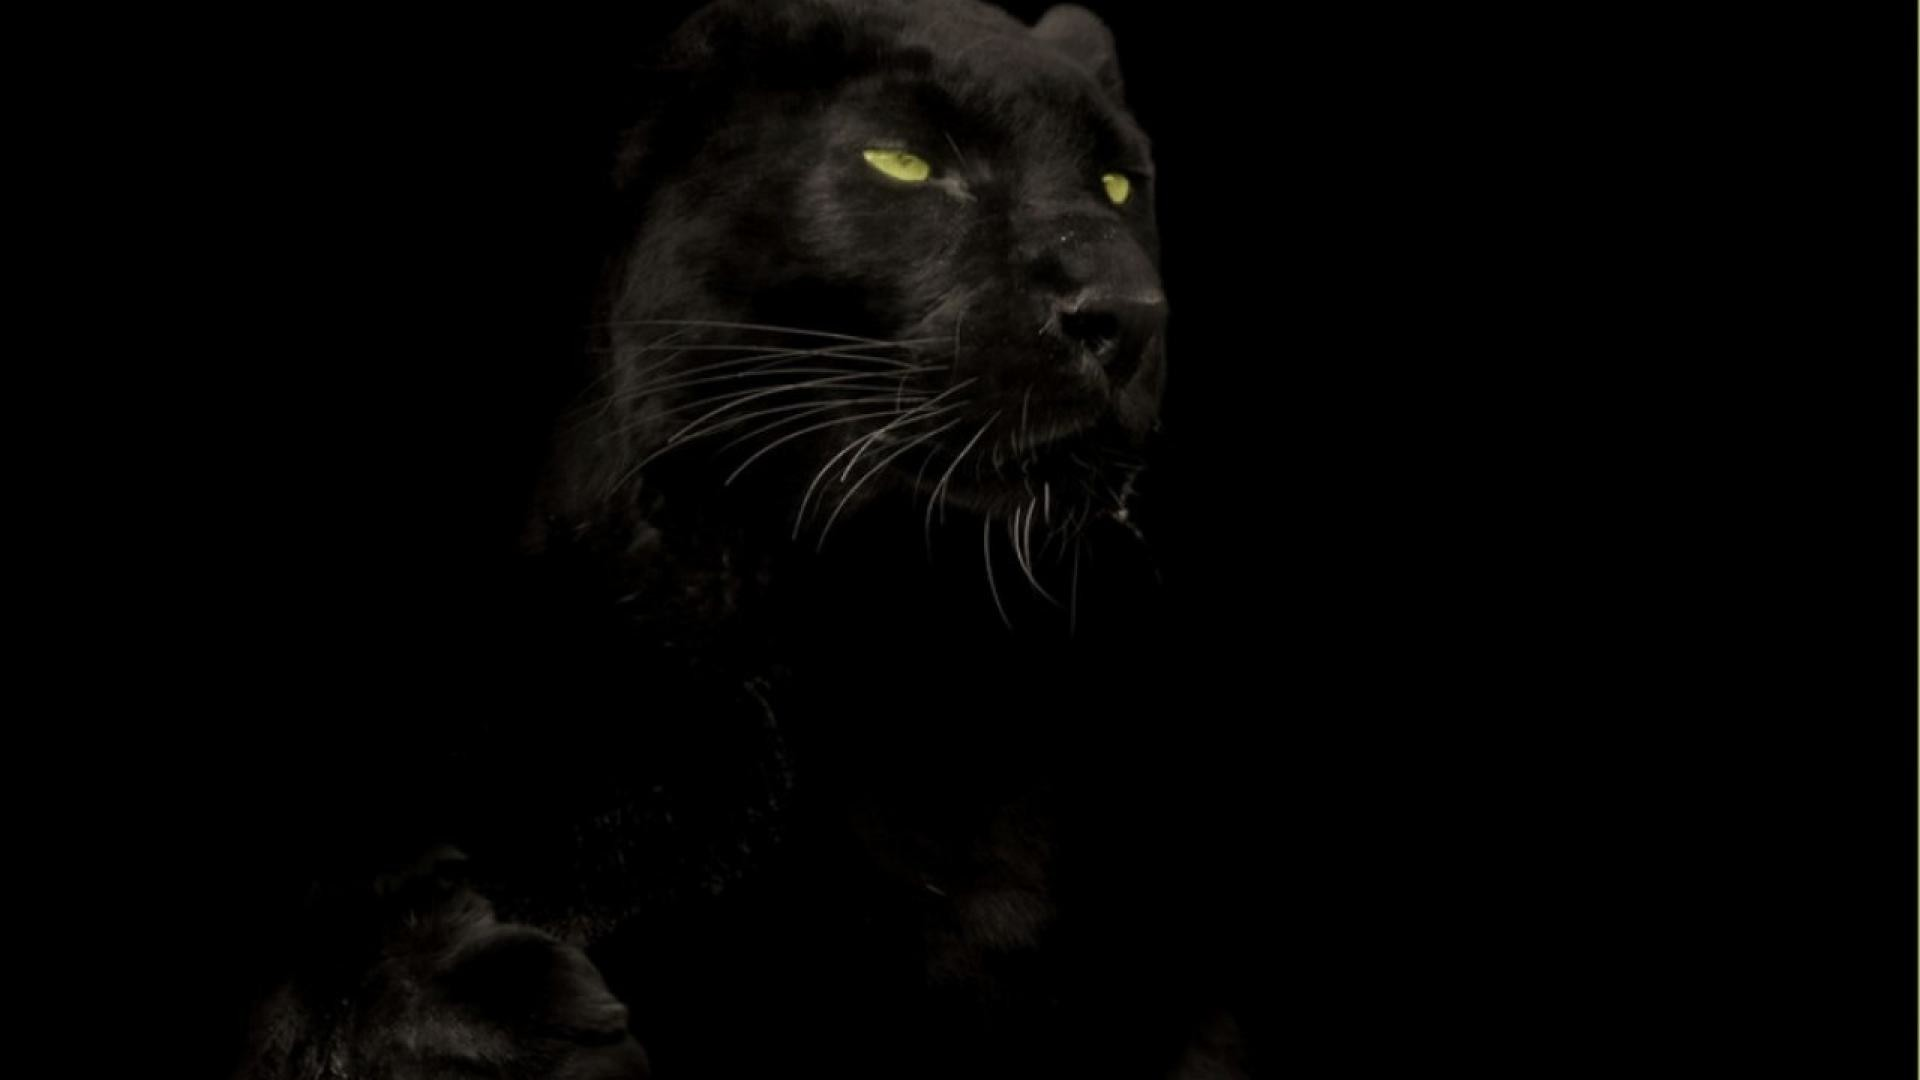 Cats animals black panther wallpaper